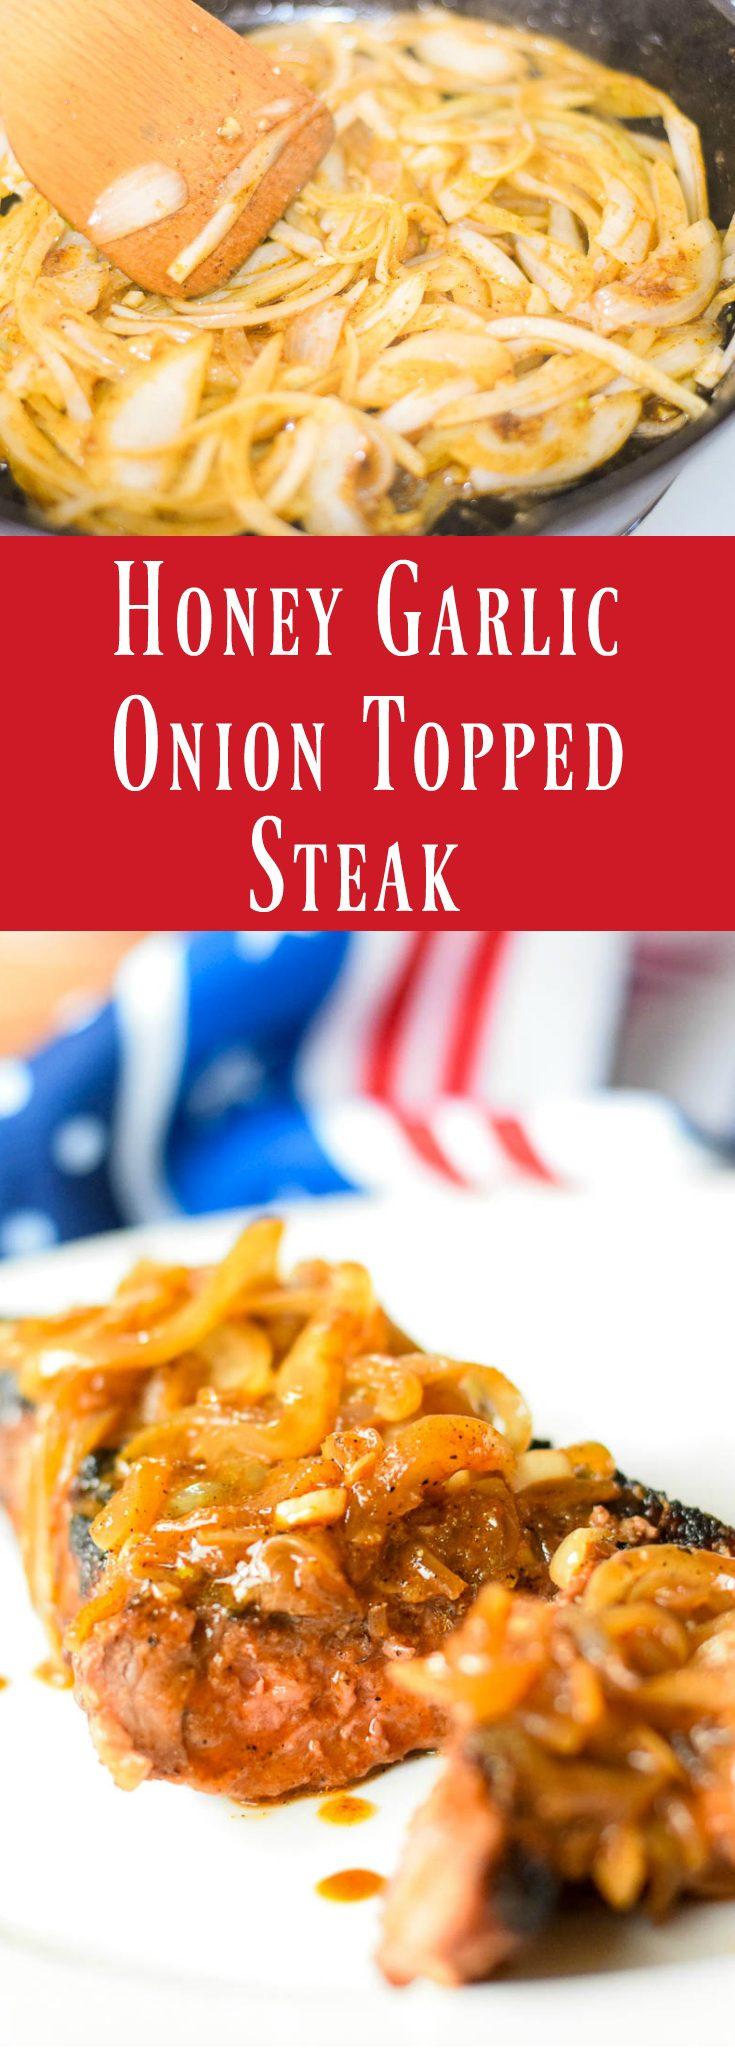 Honey Garlic Onion Topped Steak #honey #garlic #onions #condiment #steak